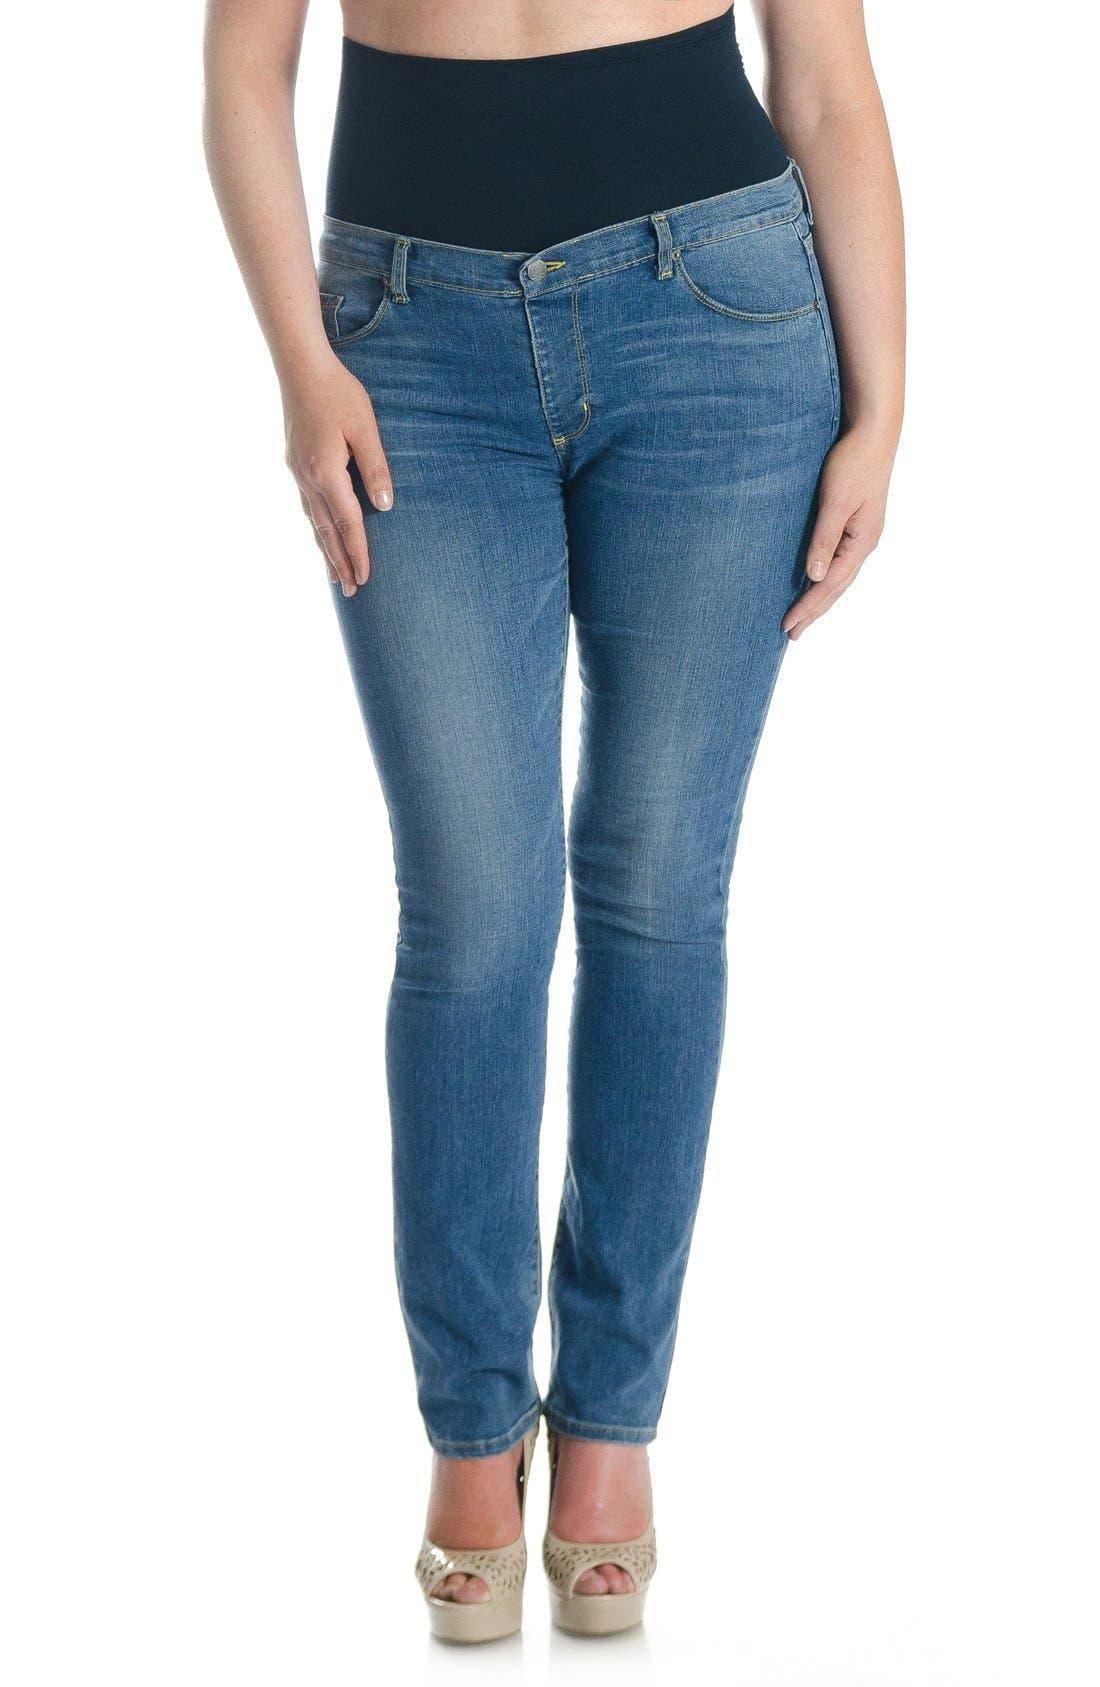 Mid Rise Straight LegShapewearJeans,                             Main thumbnail 1, color,                             Light Wash